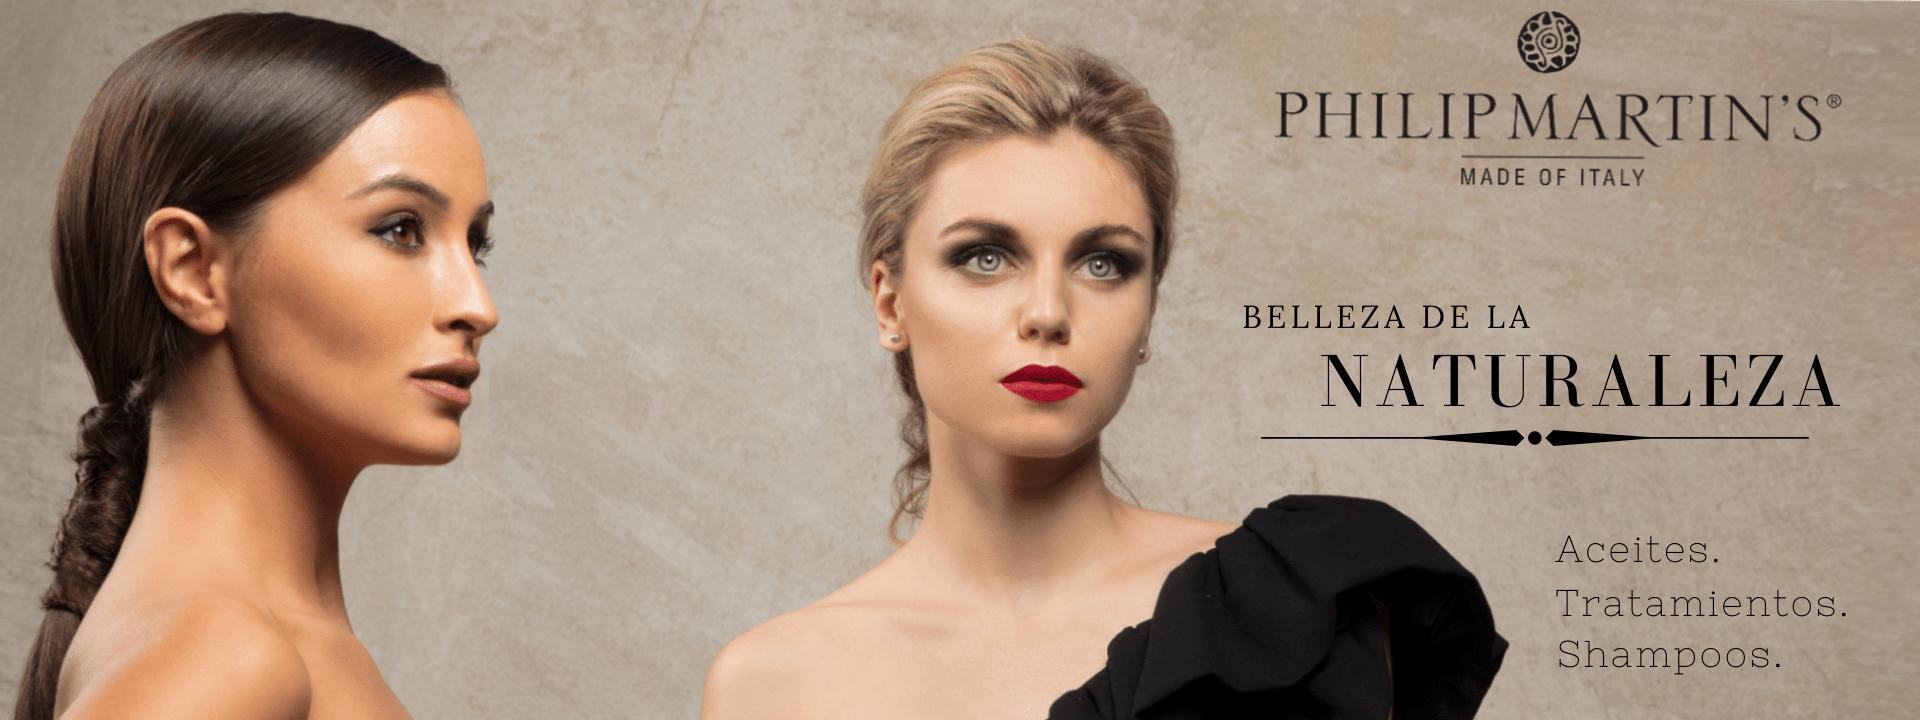 BANNER PHILIP MARTINS- cosmetis.com.mx